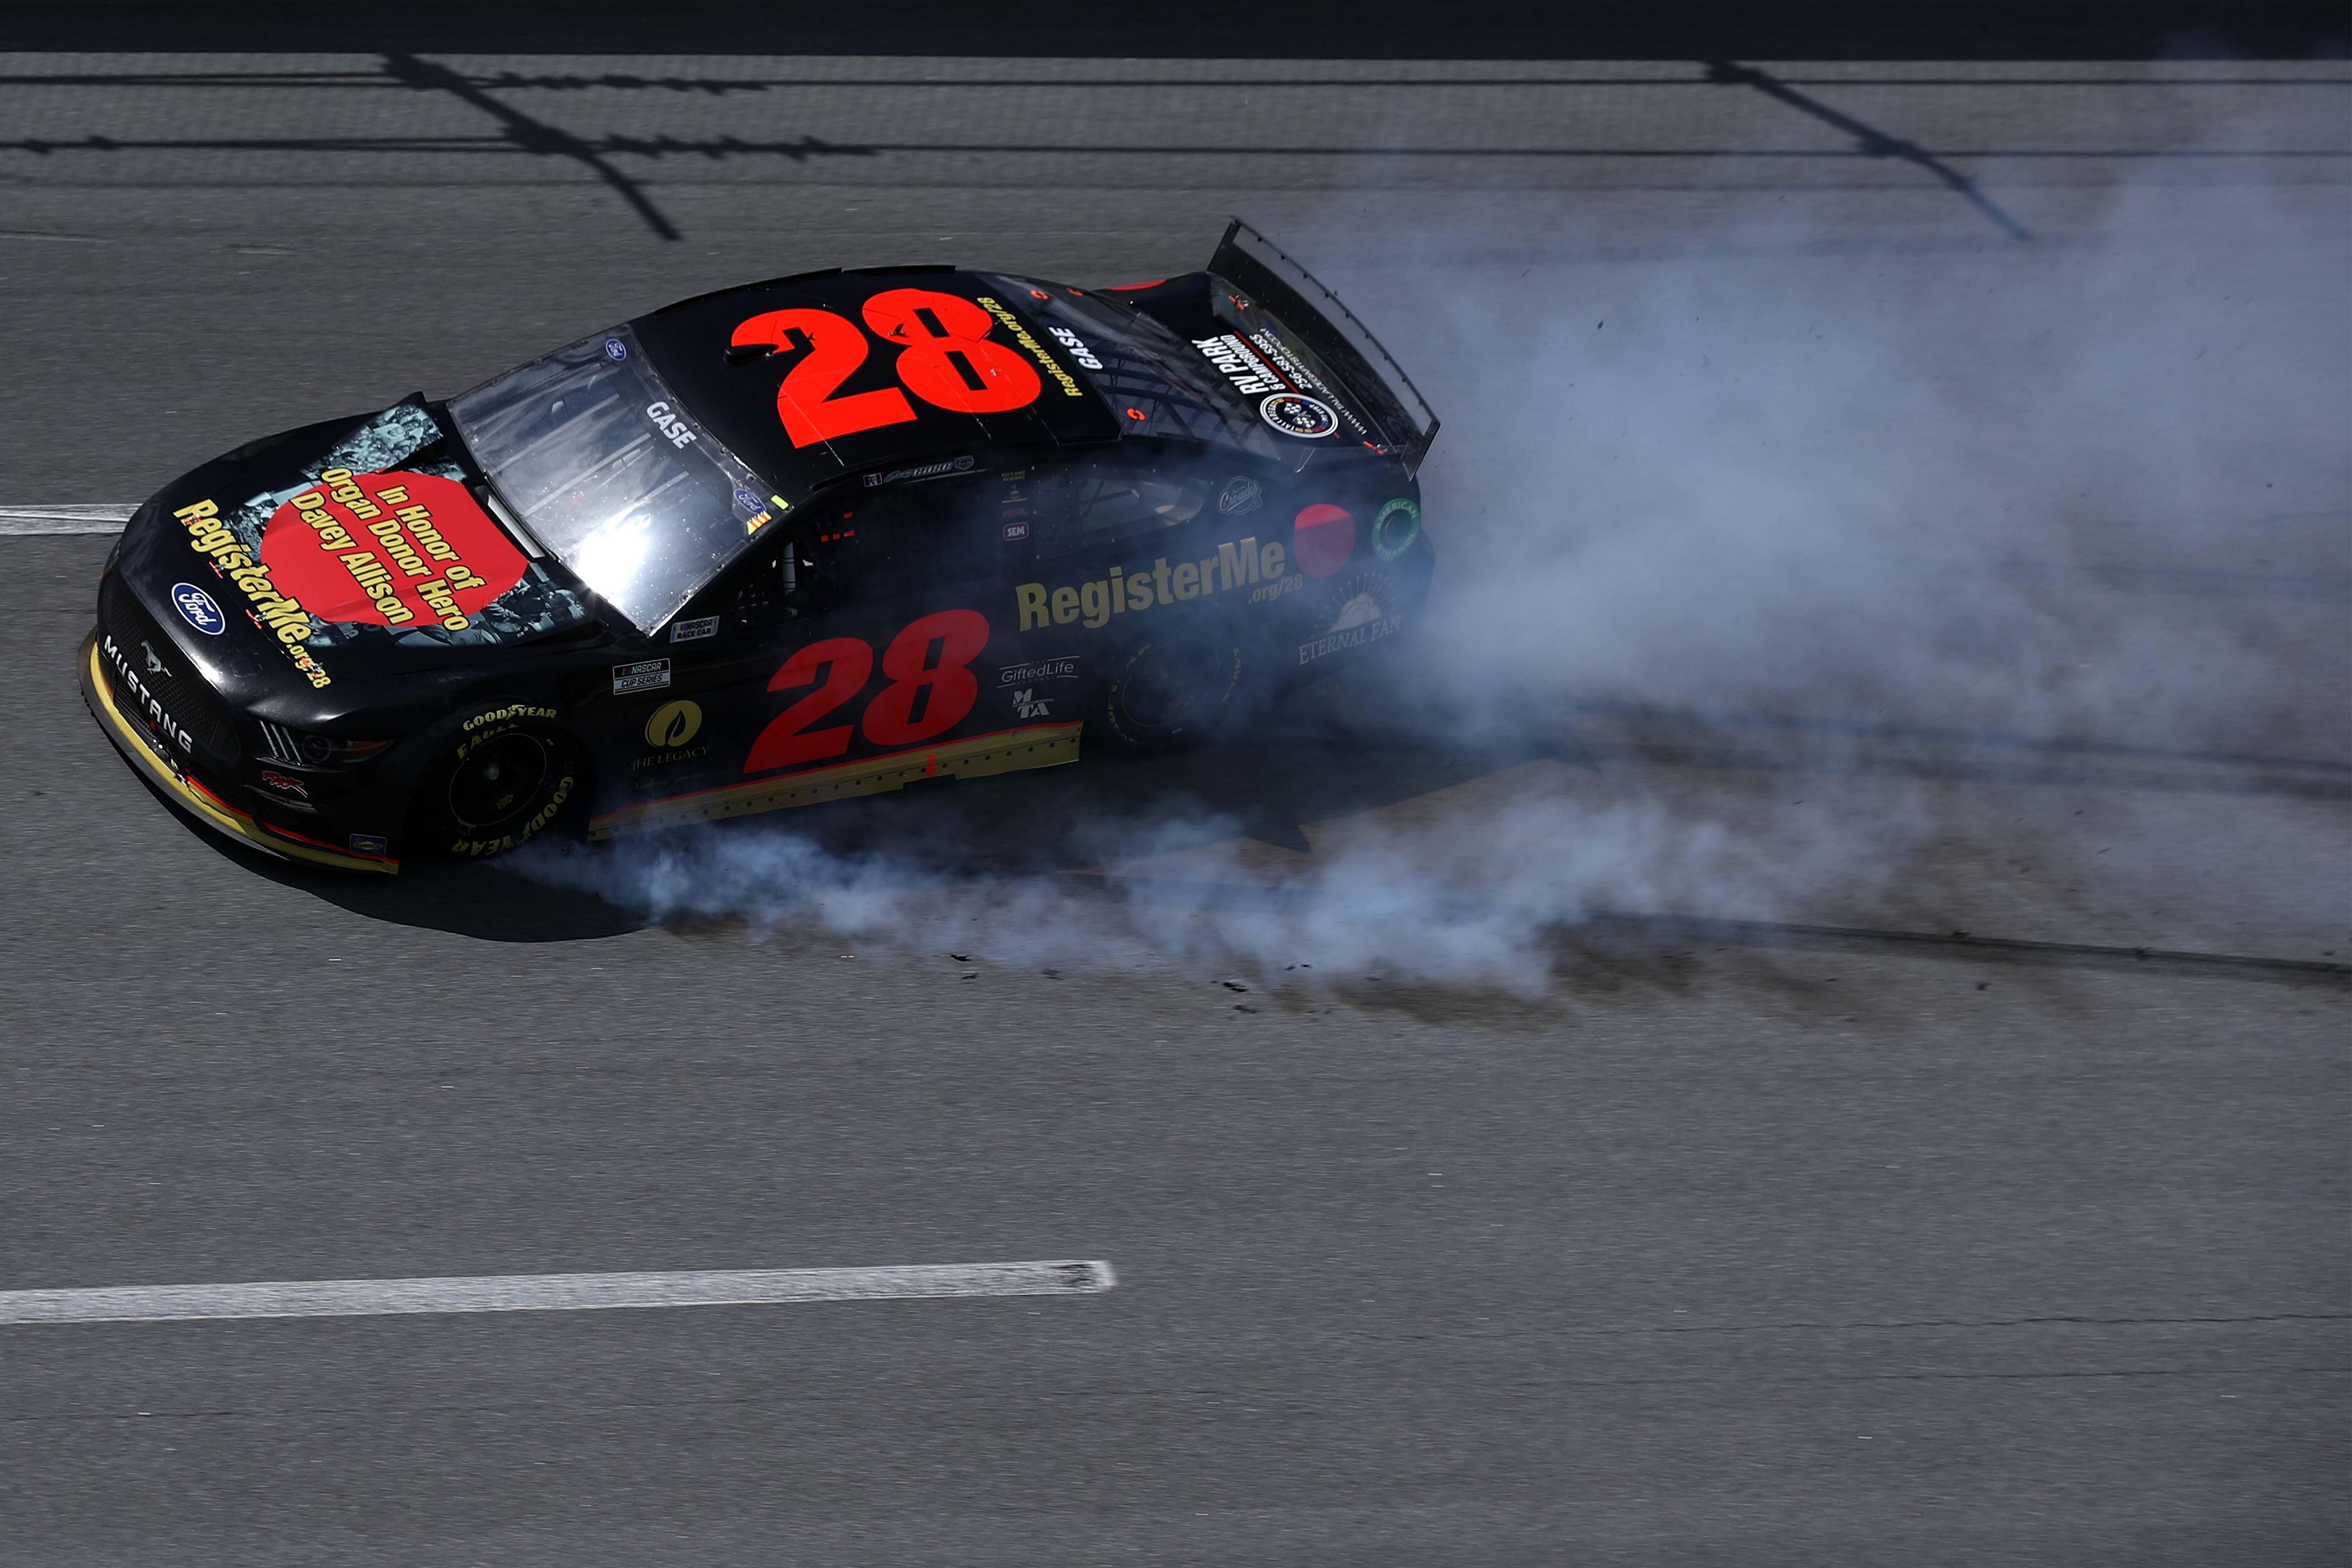 Joey Gase - Davey Allison tribute car - Talladega Superspeedway - NASCAR Cup Series